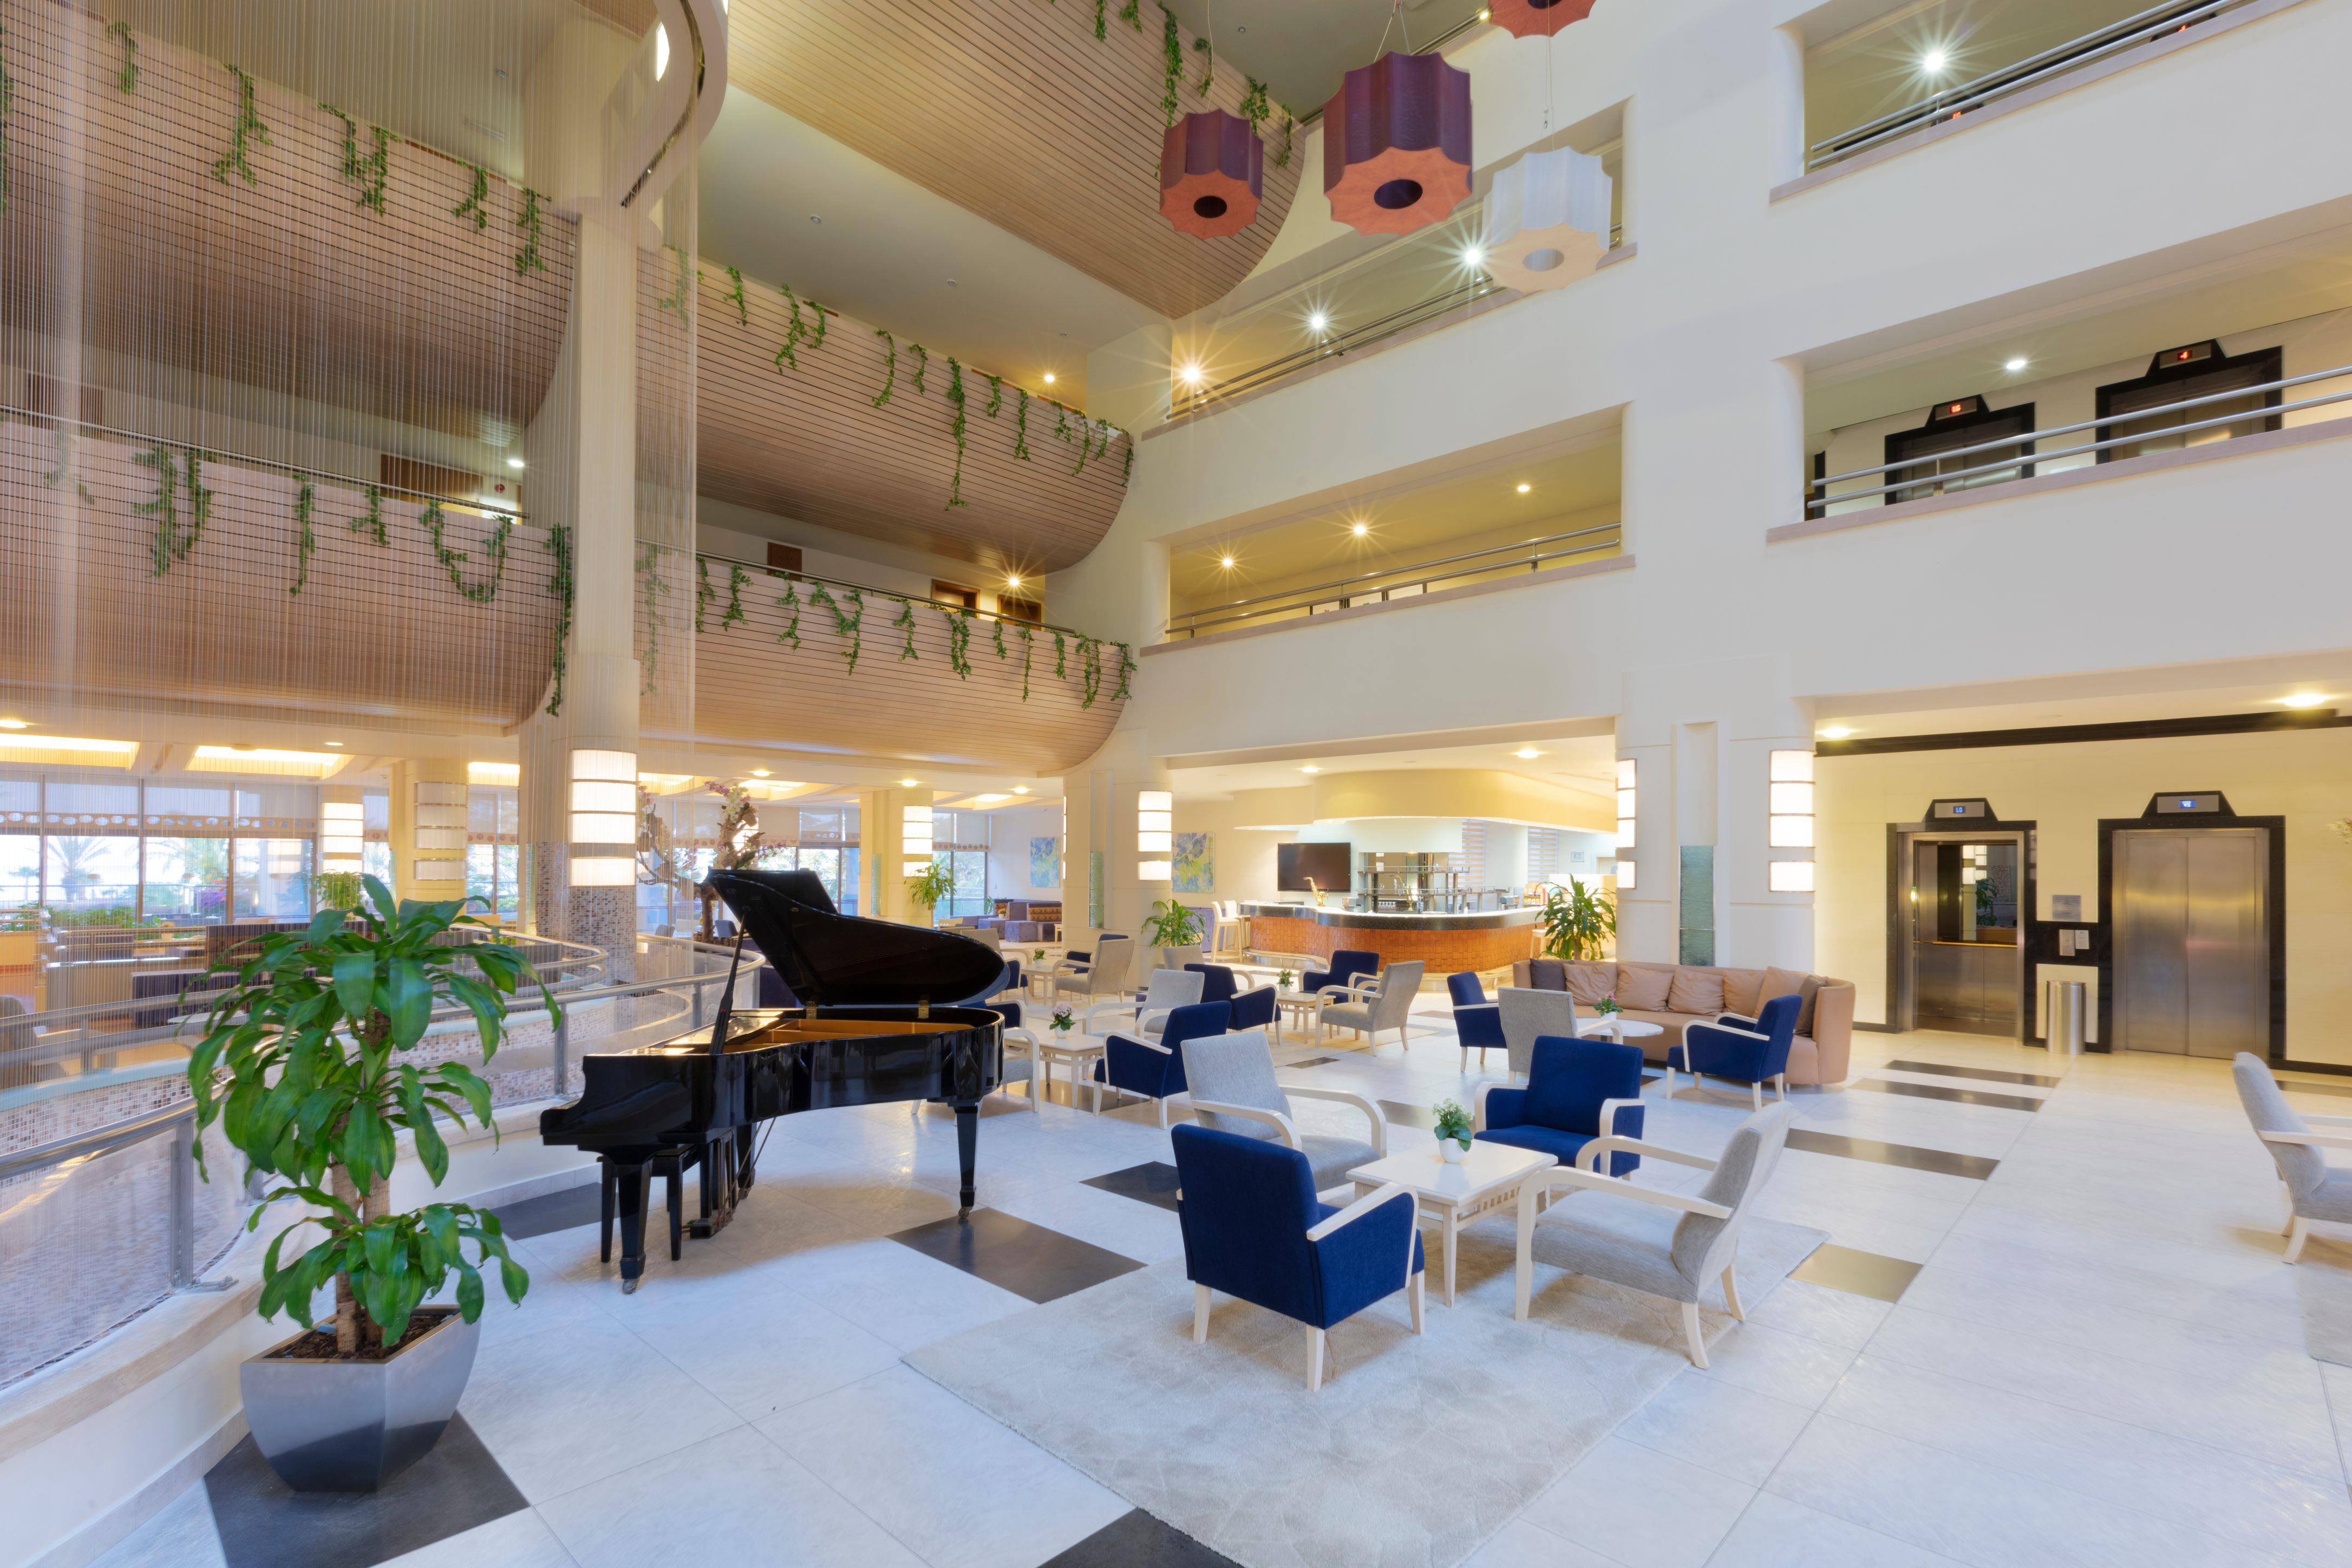 http://www.orextravel.sk/OREX/hotelphotos/zeynep-hotel-general-0026.jpg